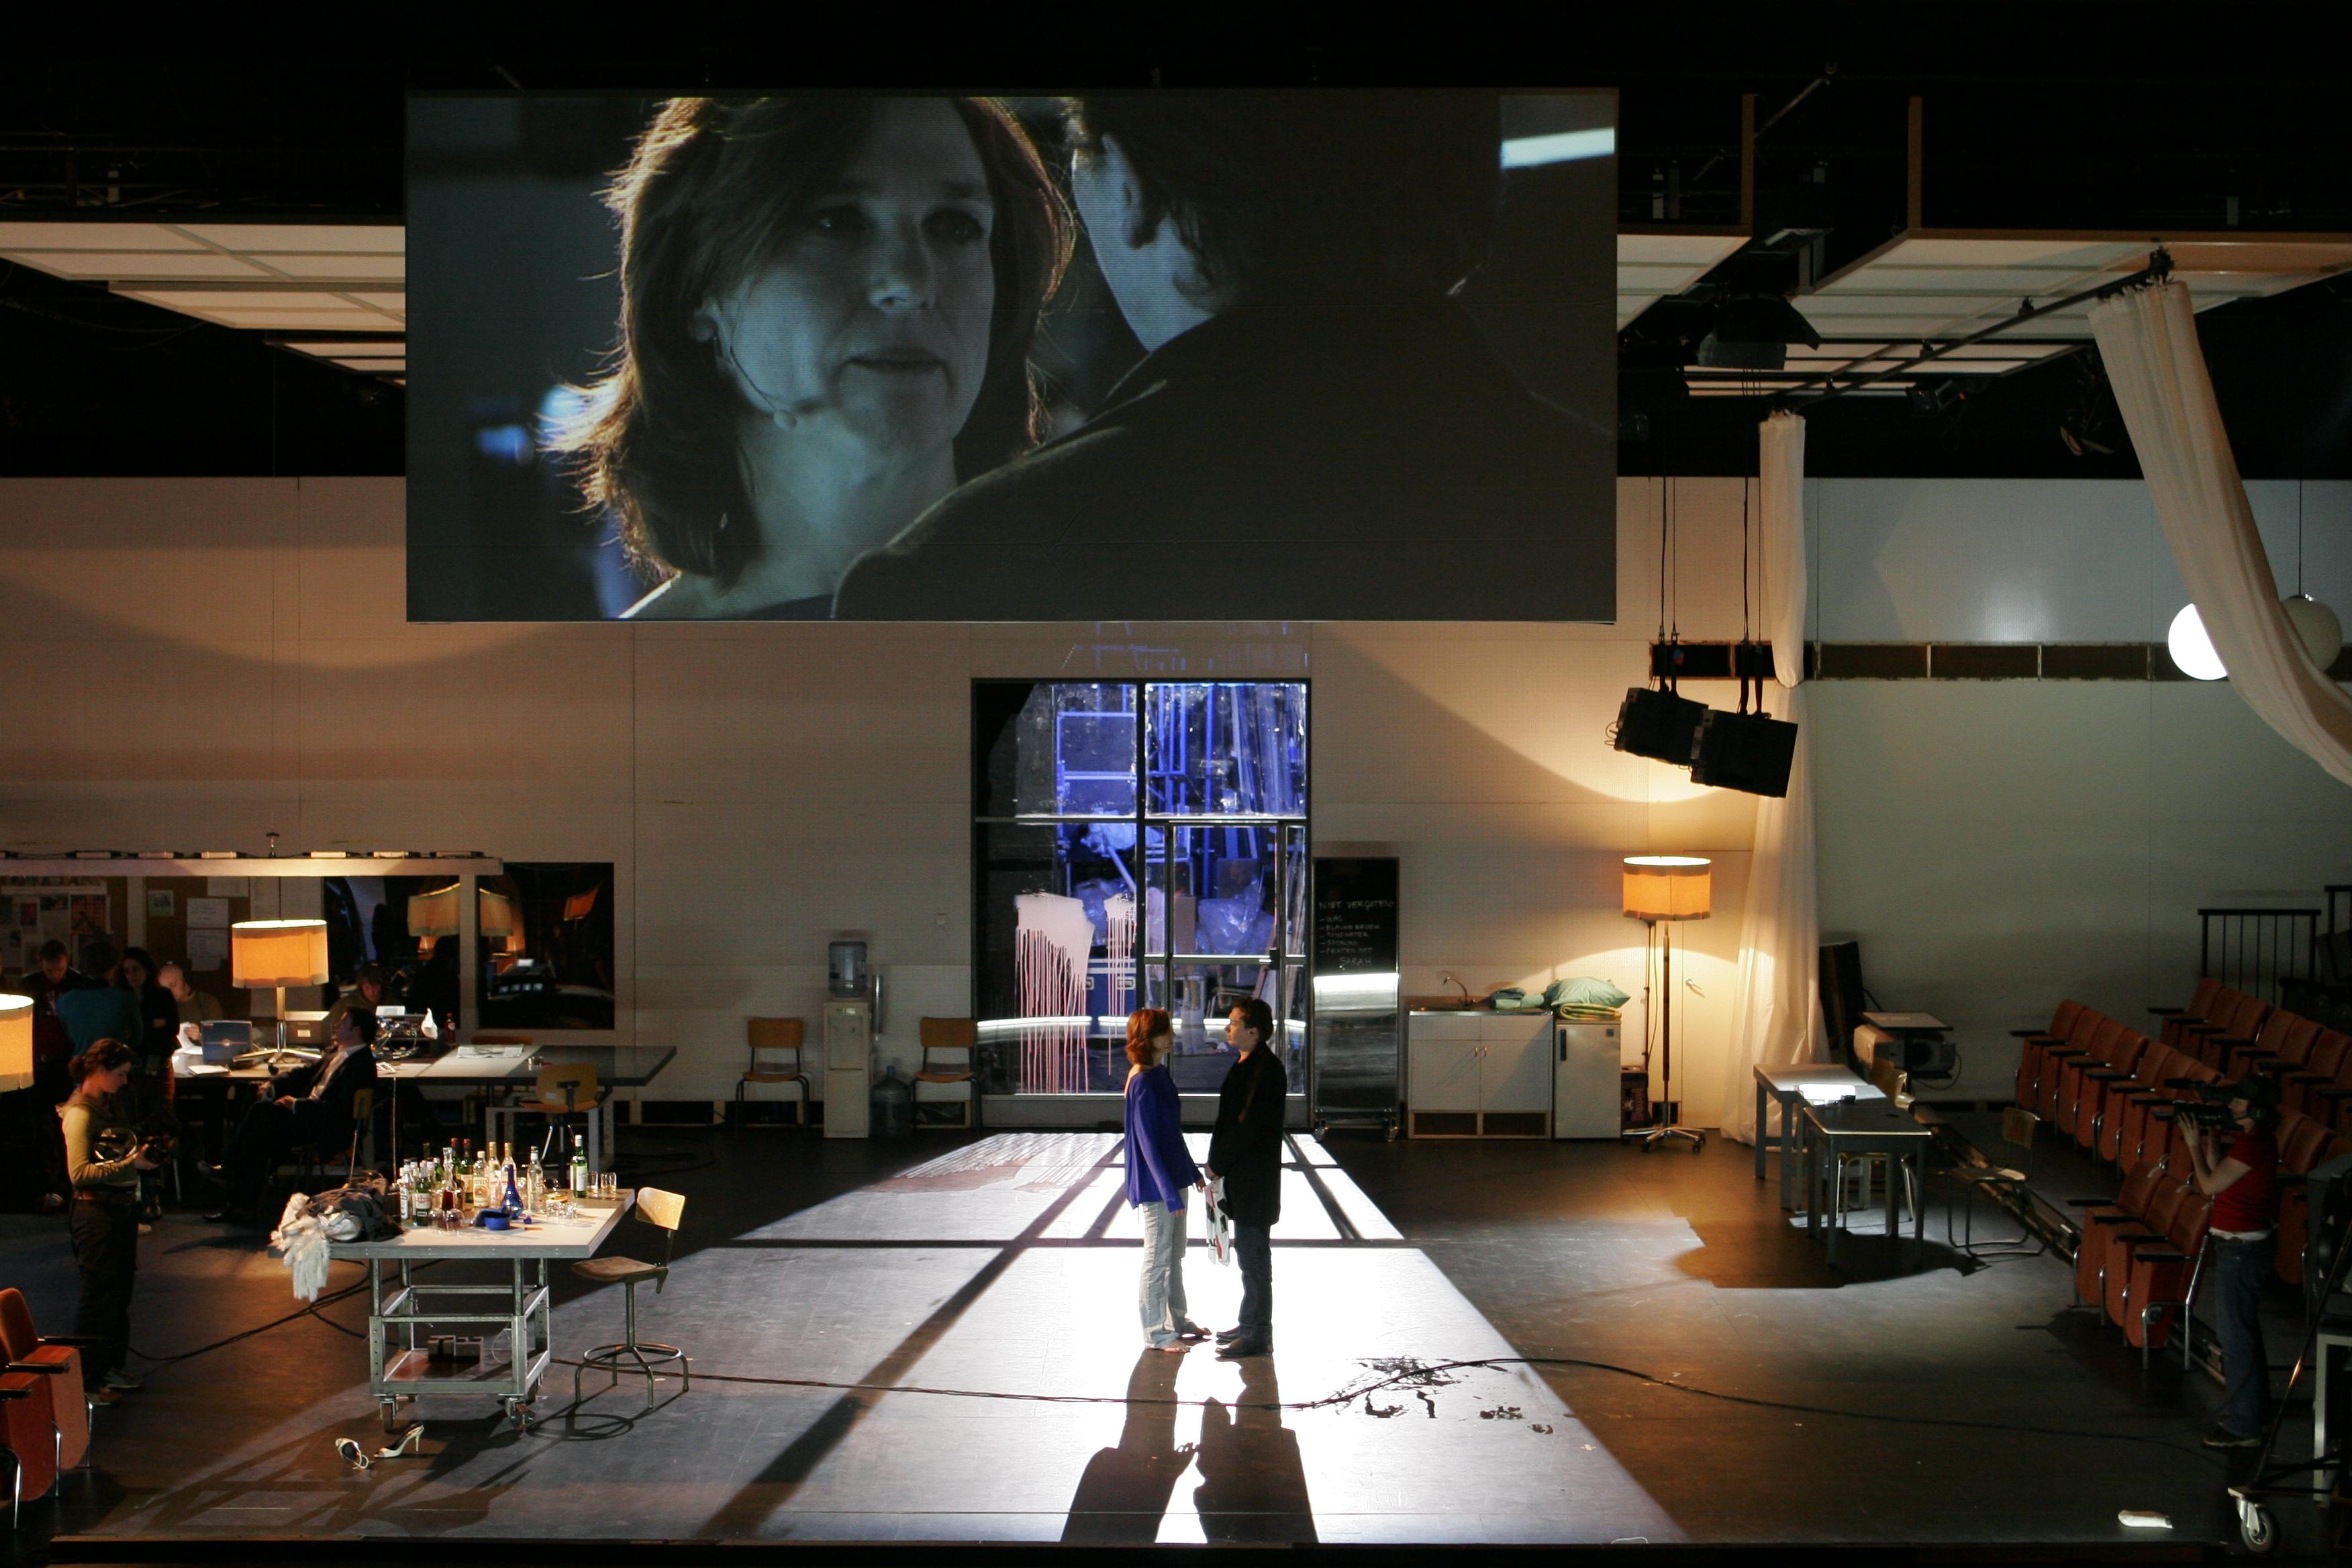 "Elsie de Brauw et Jacob Derwig dans ""Opening night"", d'après le film éponyme de John Cassavetes, mise en scène Ivo van Hove, 2006. © Jan Versweyveld"